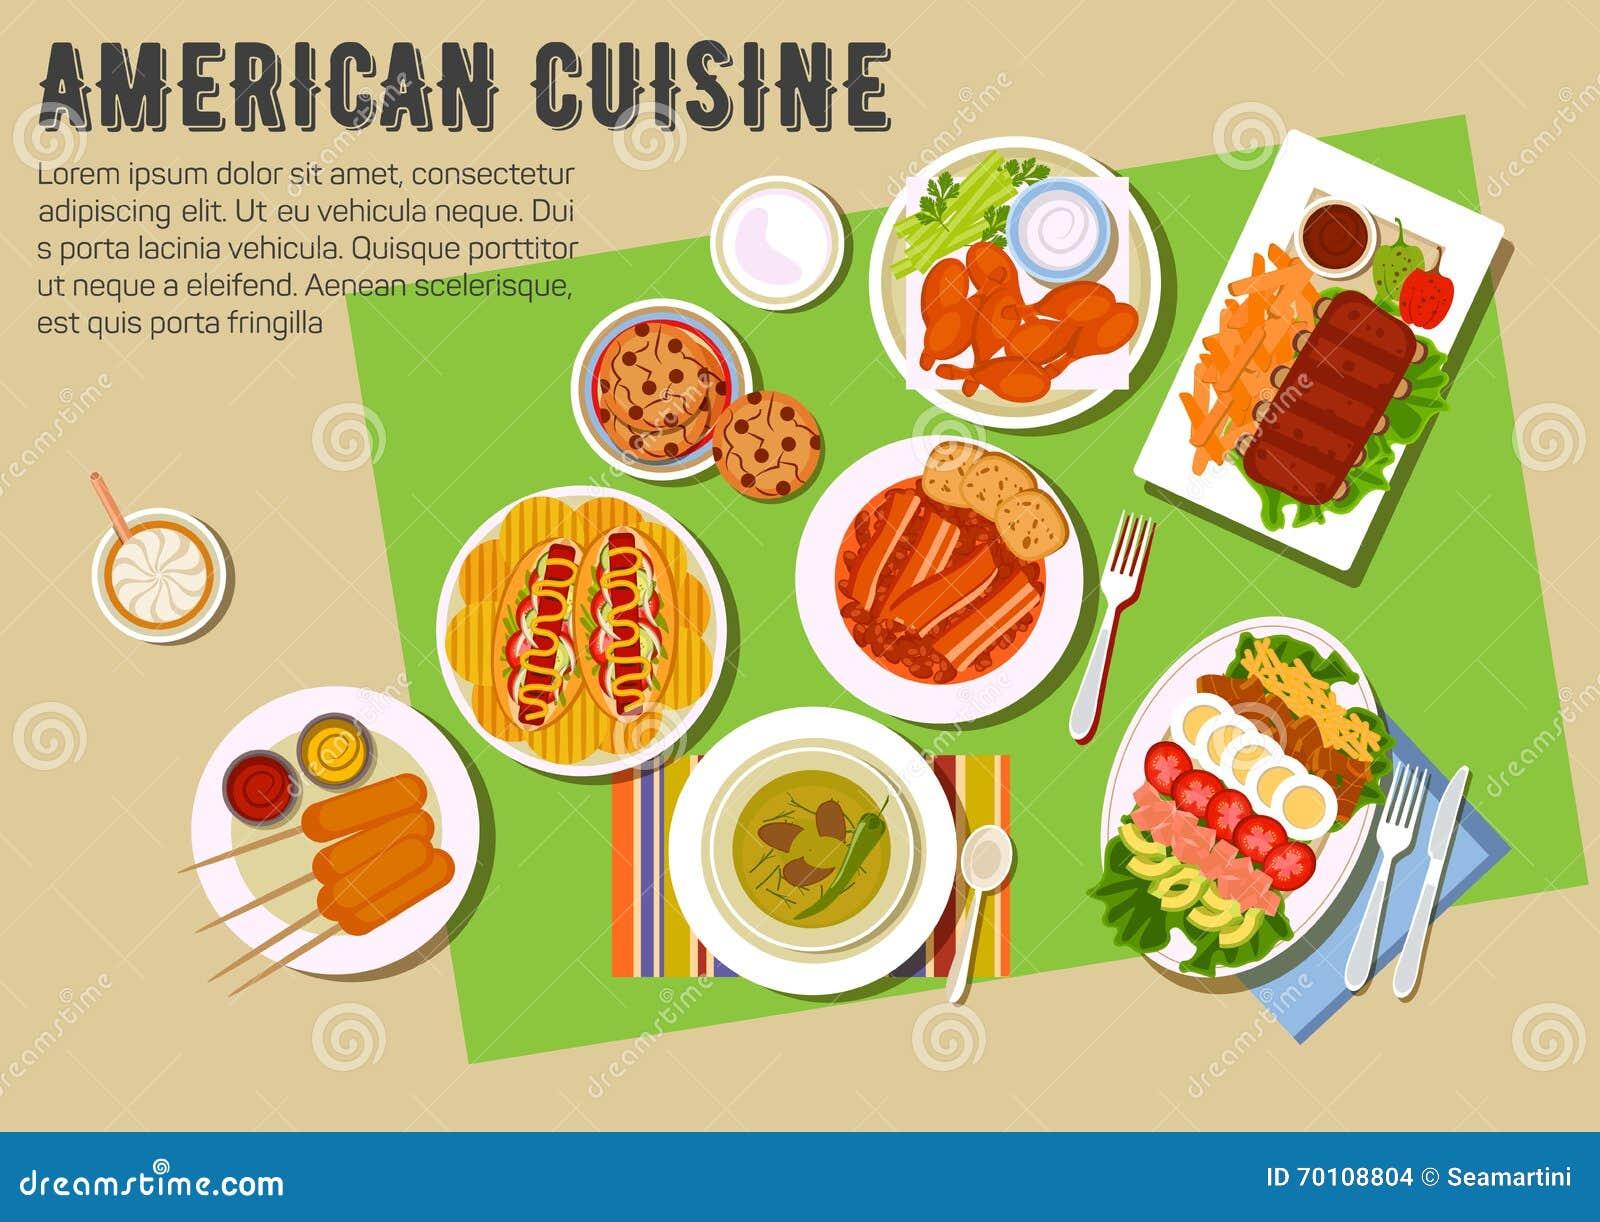 Bbq bawi si p ask ikon z ameryka skimi kuchni for 416 americana cuisine